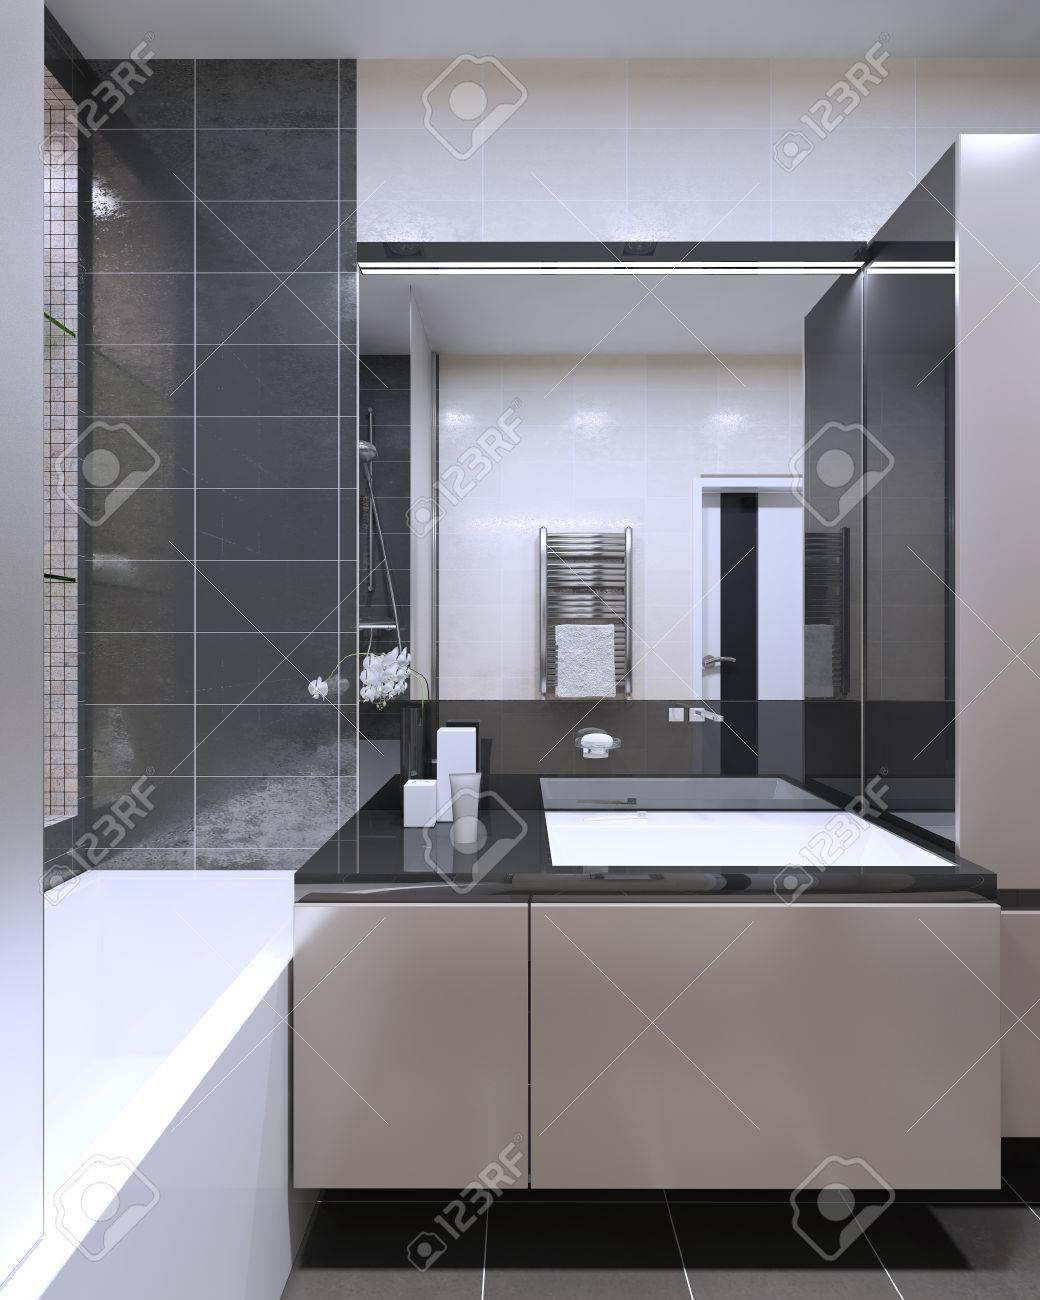 Salle De Bain De Style Contemporain Avec Un Grand Miroir Avec Des